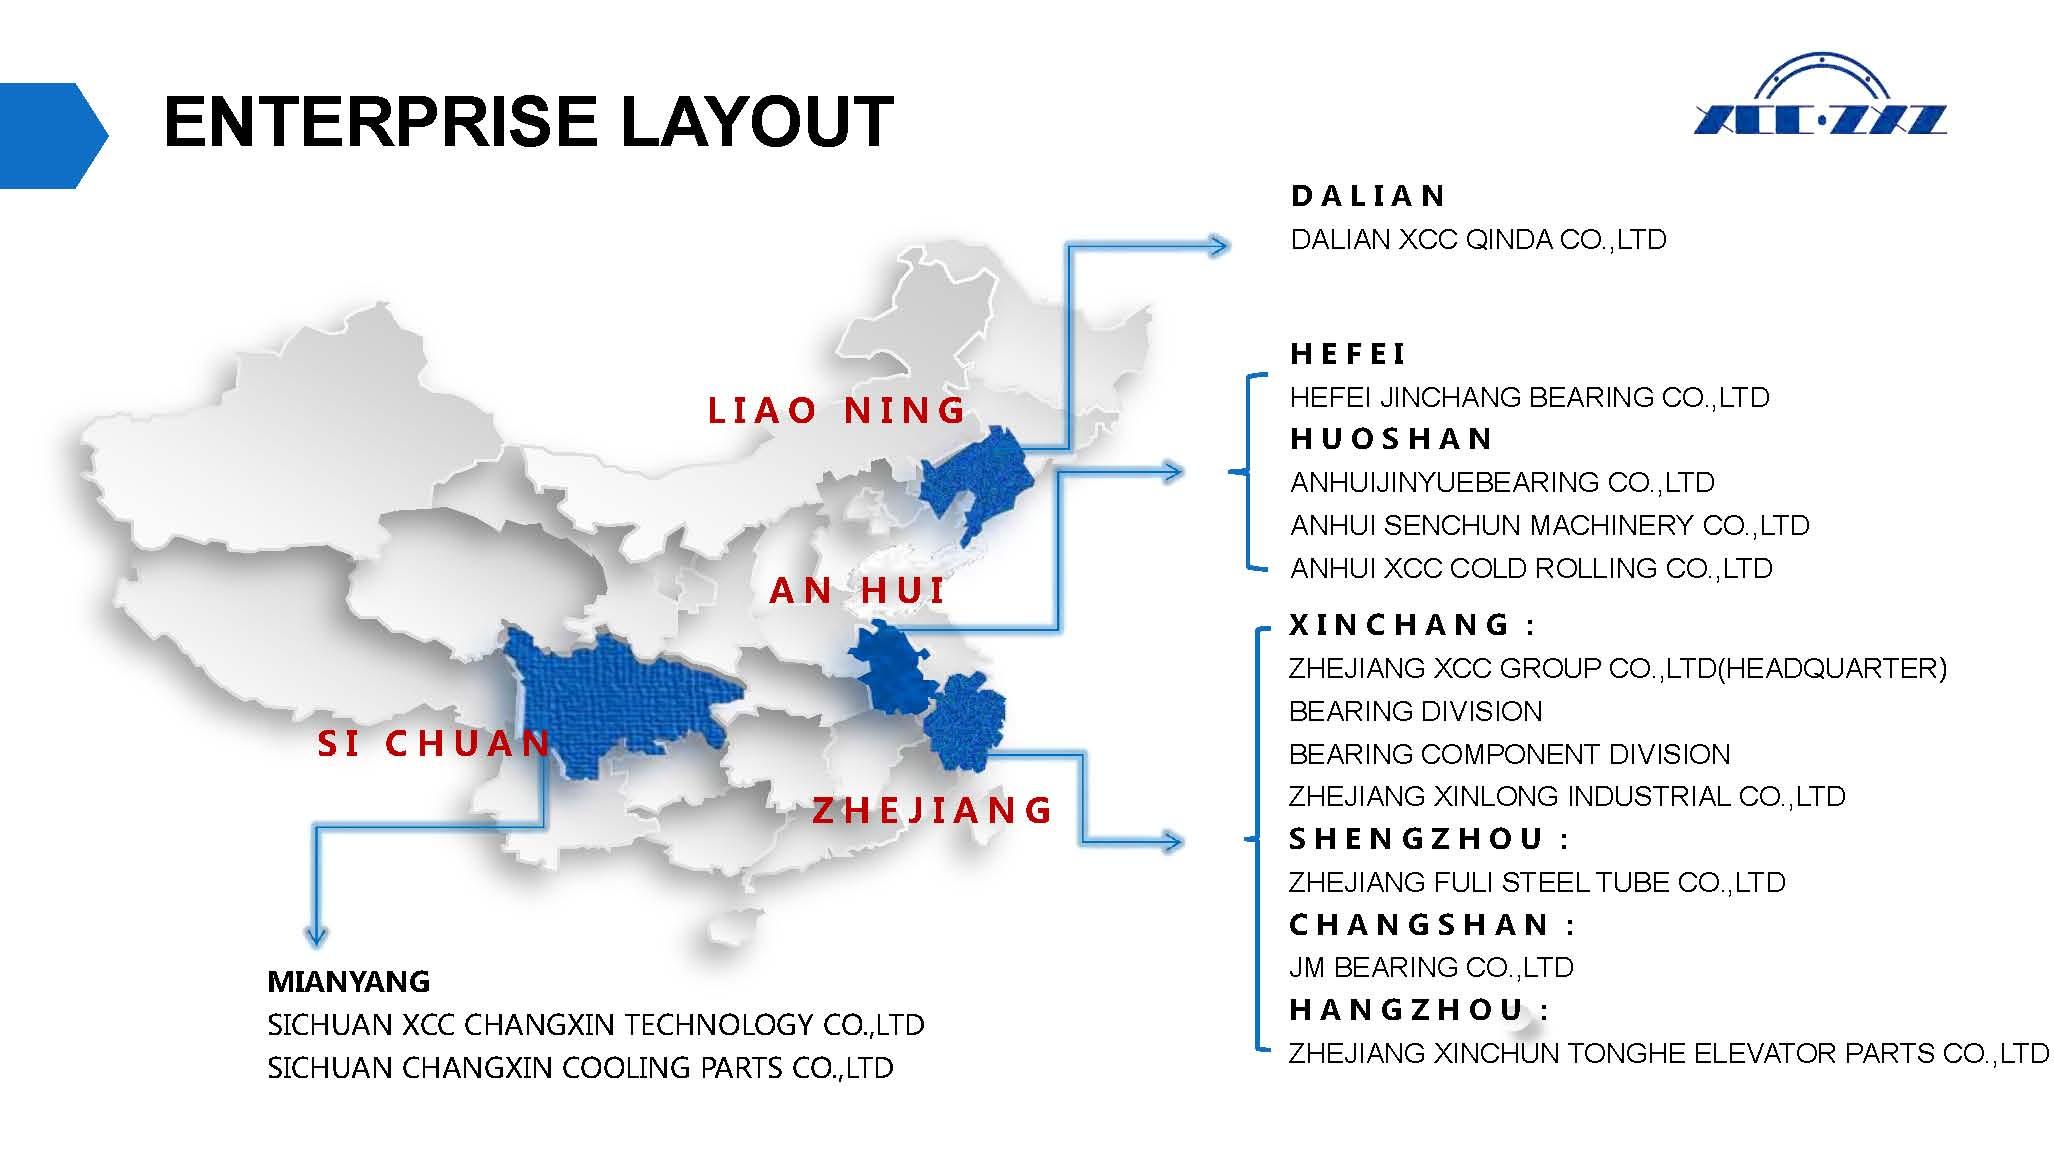 Enterprise Layout